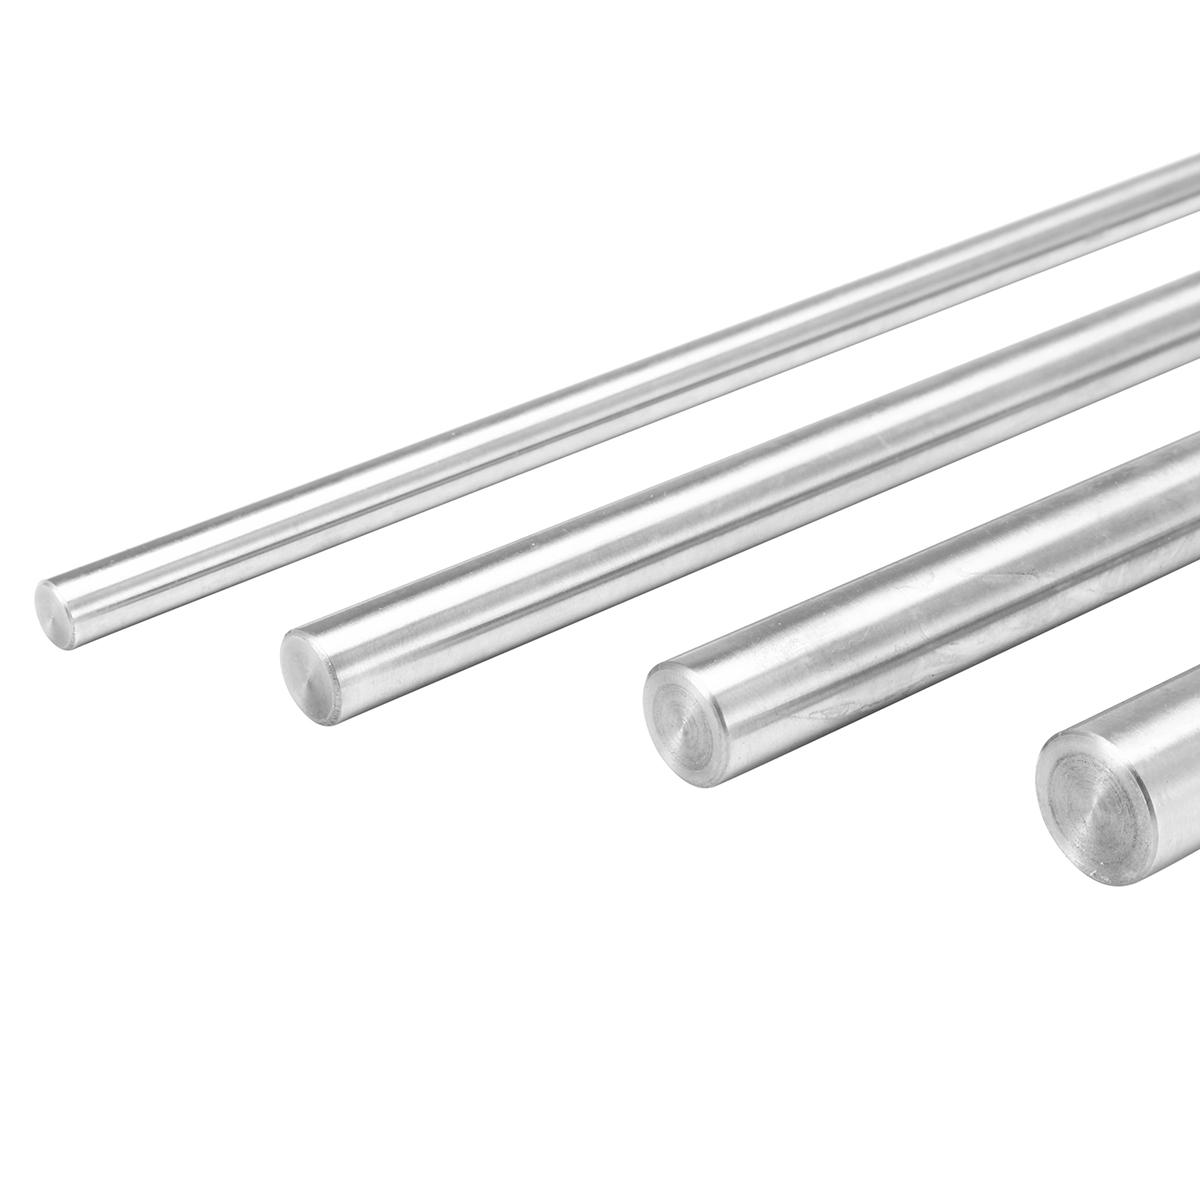 6/8/10/12mm Diameter Rod Length 400mm Steel Cylinder Linear Rail Linear Shaft Optical Axis